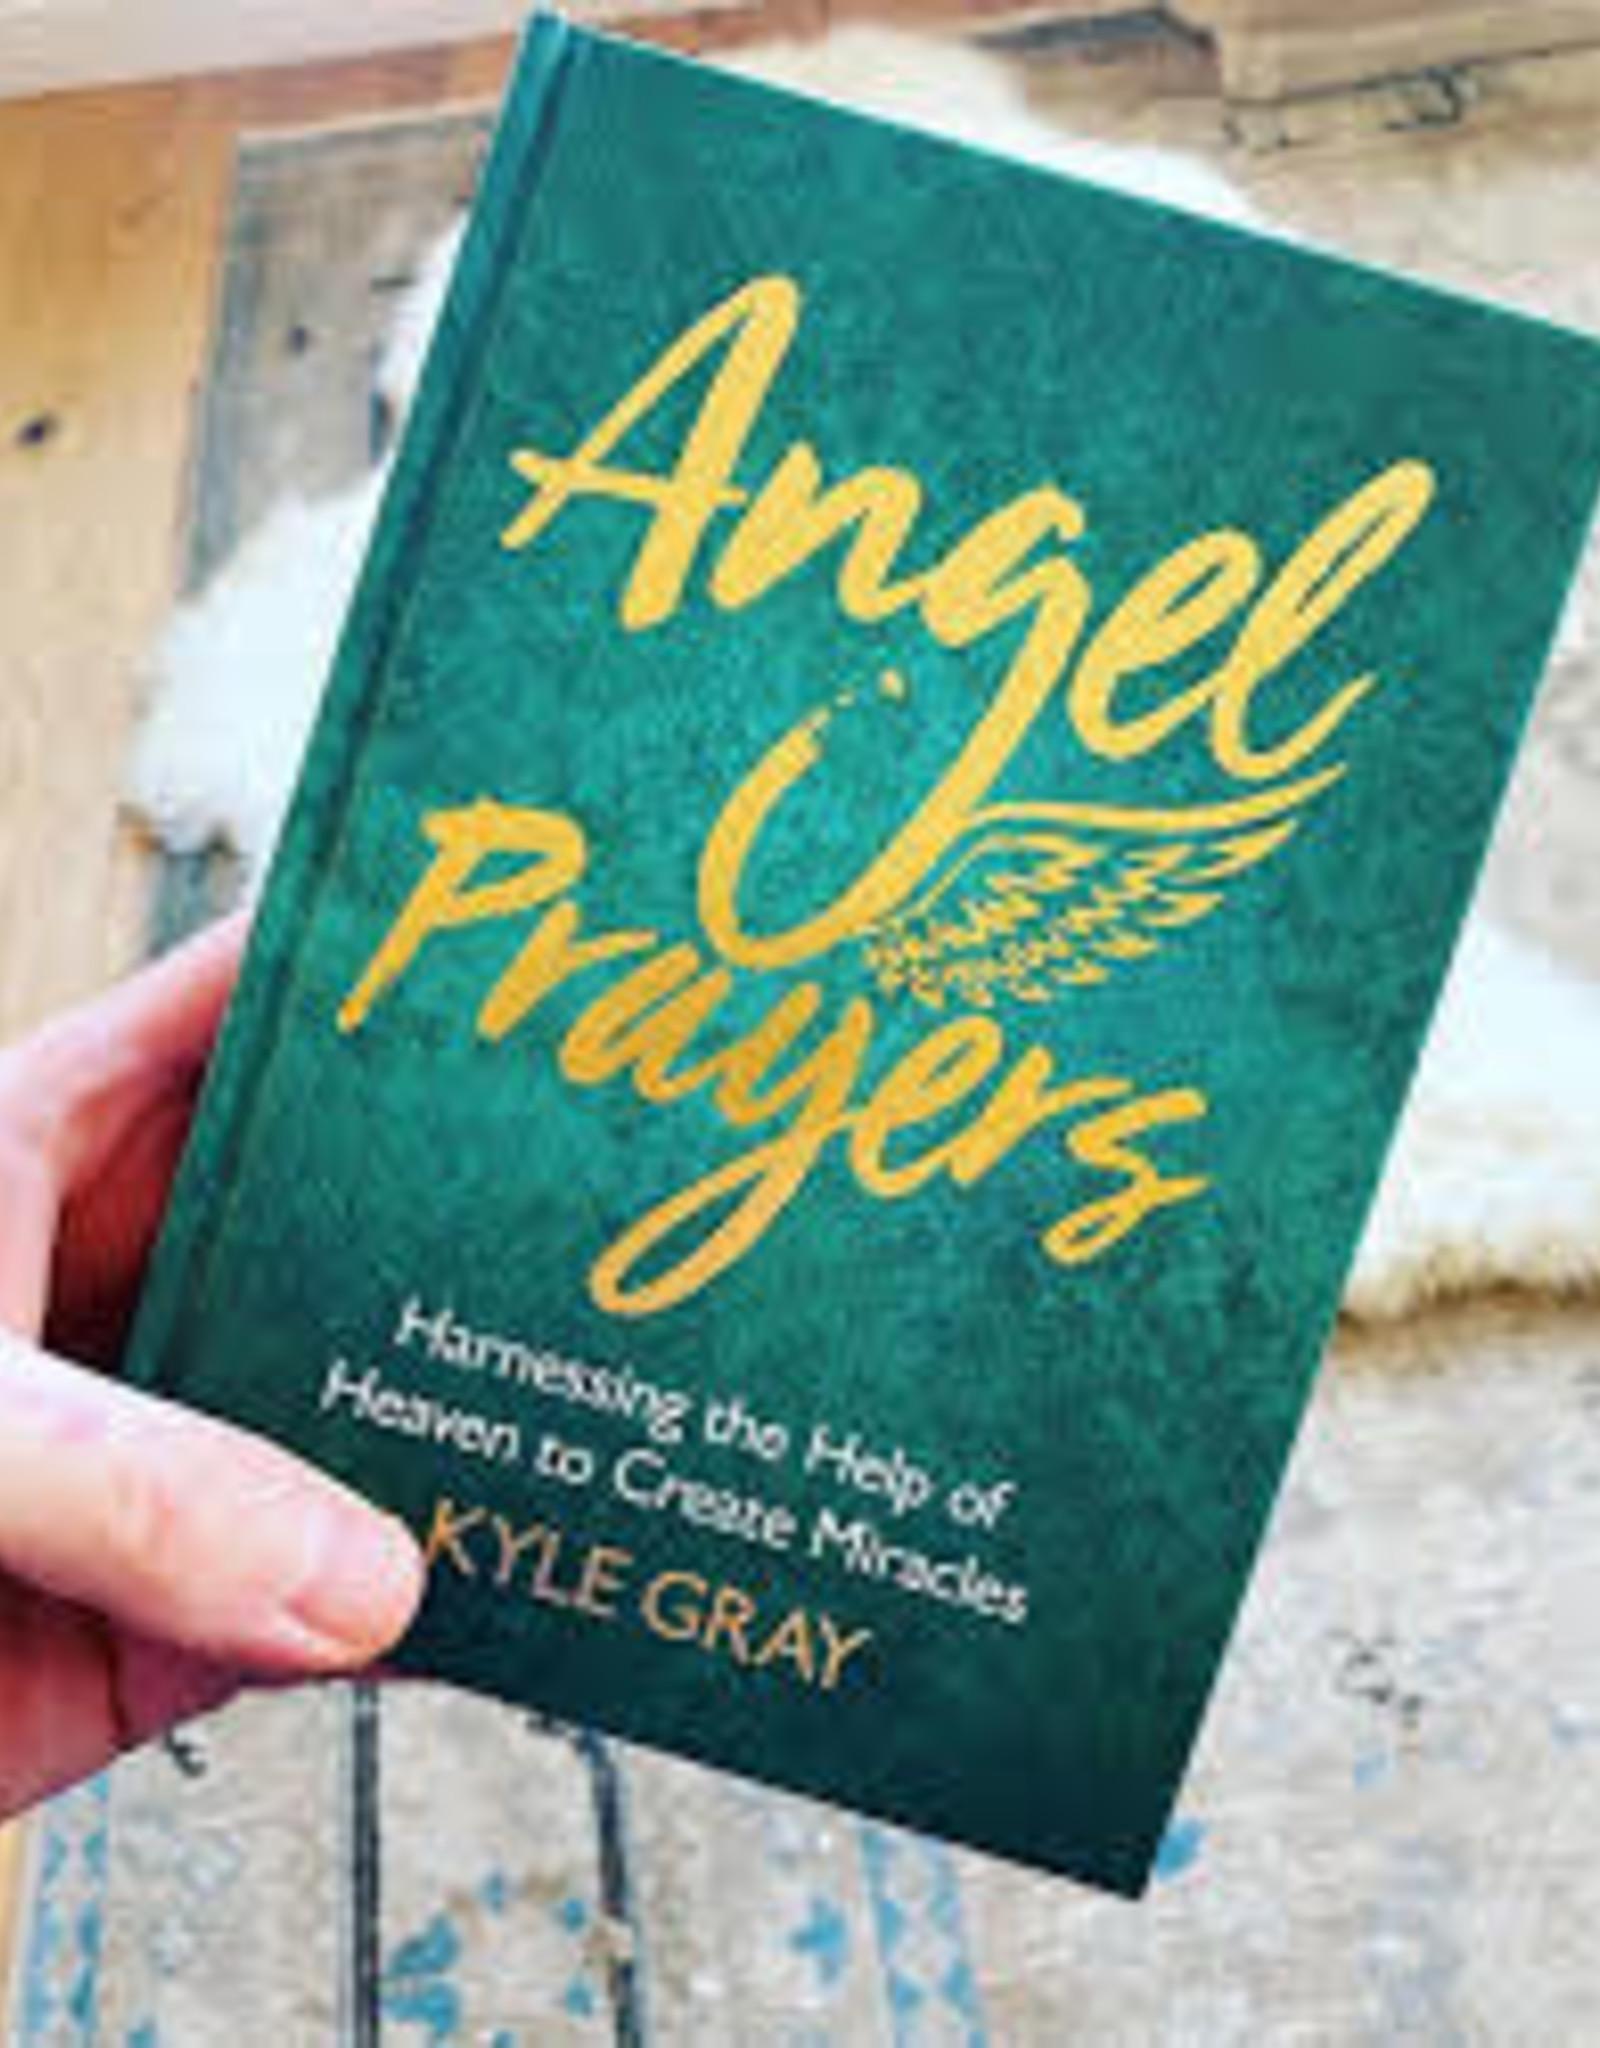 Kyle Gray Angel Prayers By Kyle Gray